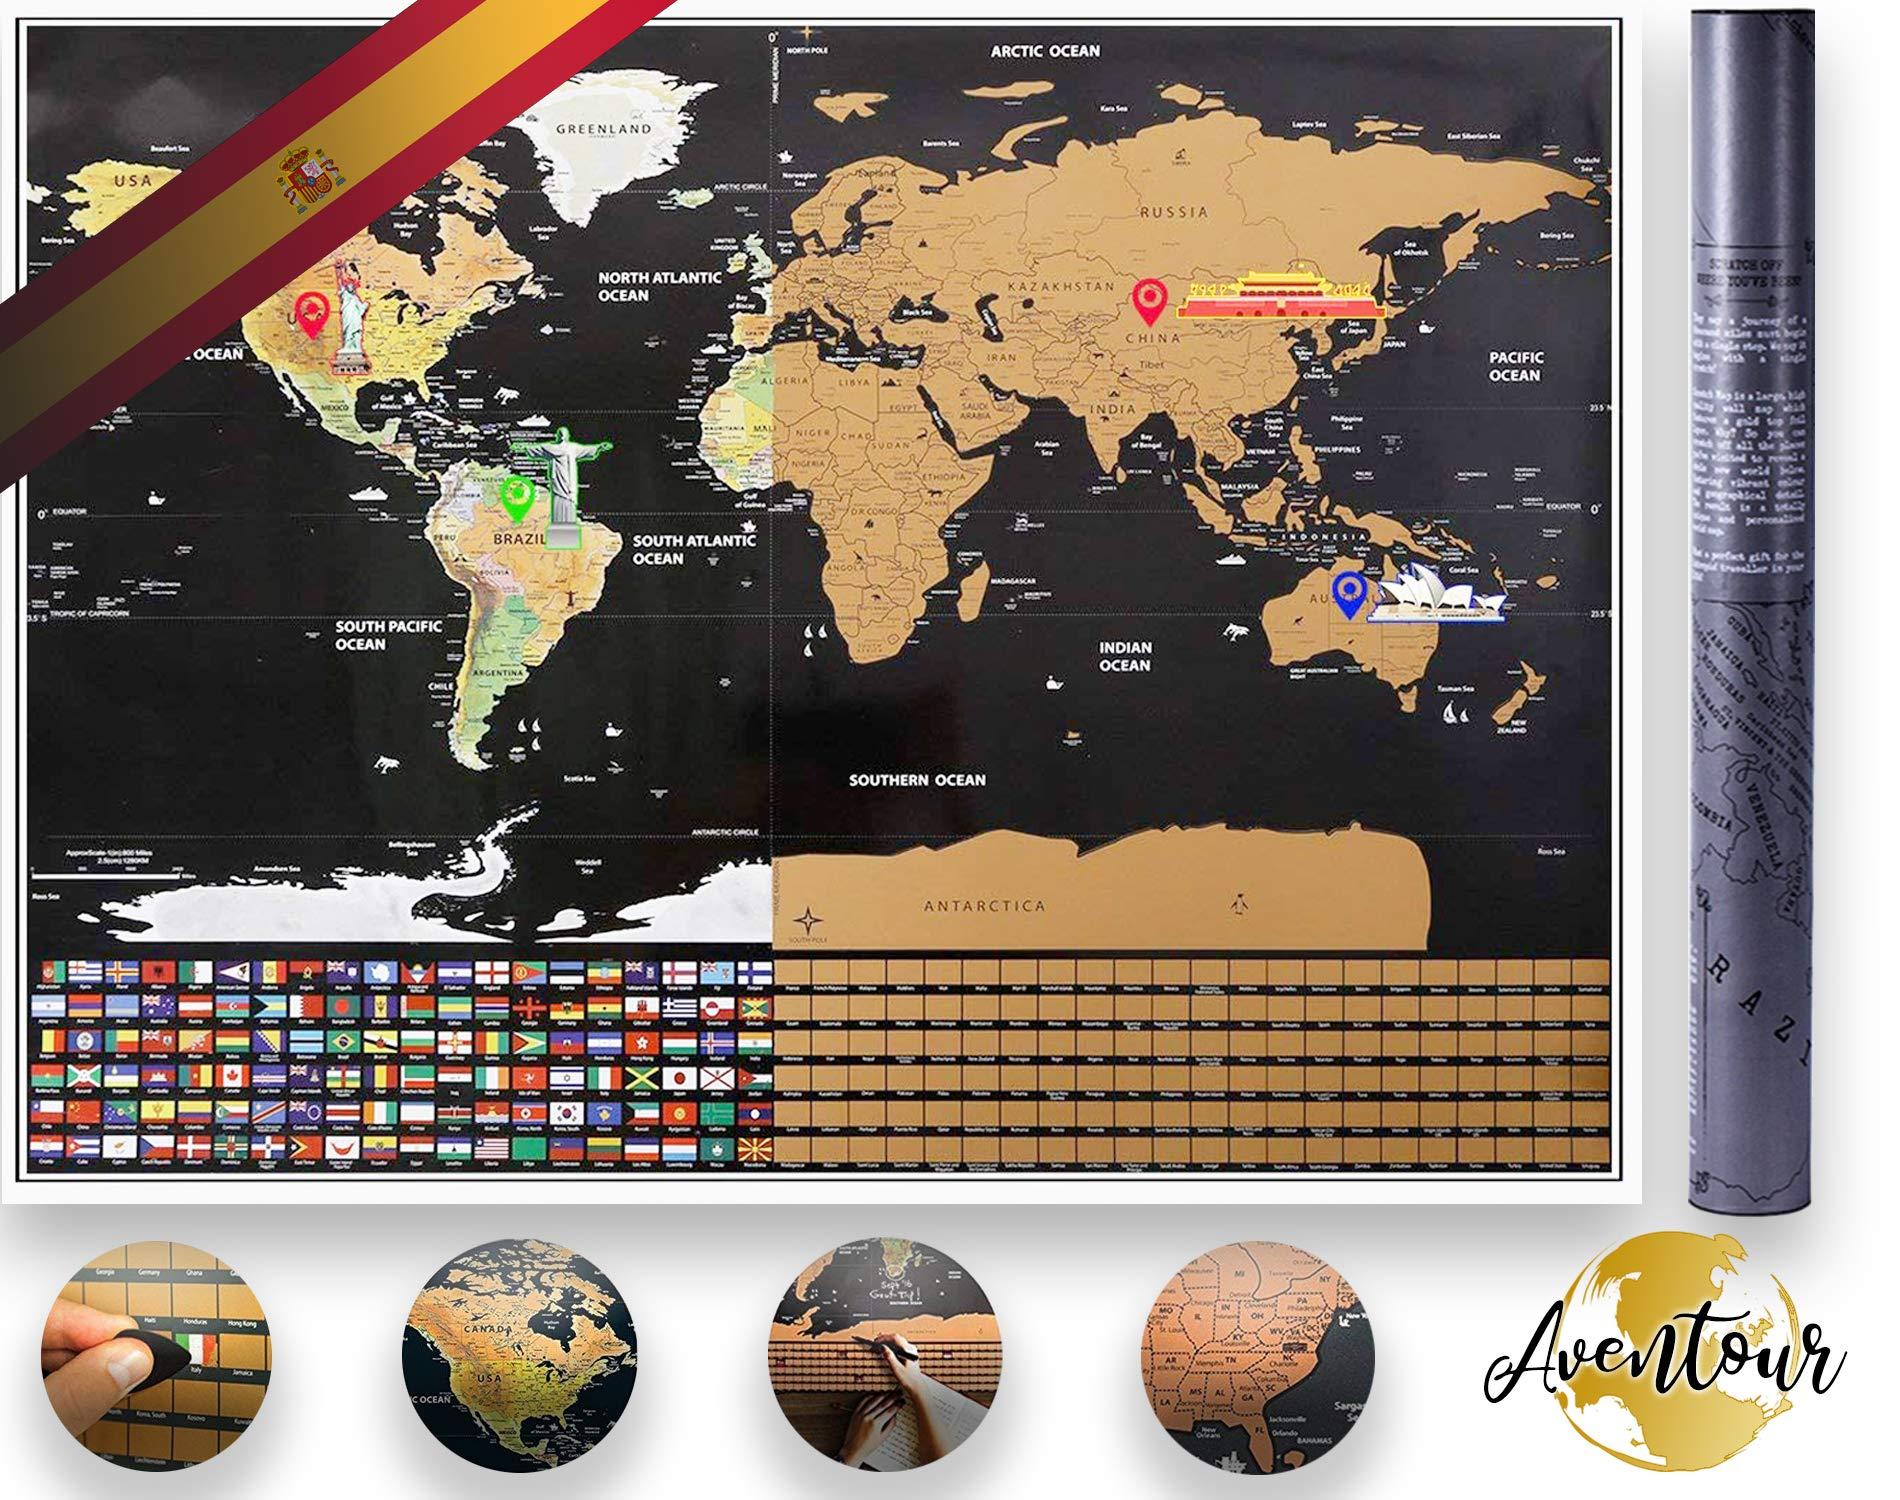 Aventour Mapa Mundi Para Rascar | 800x600mm Mural Grande Del Mundo XXL | Poster Mundial Con